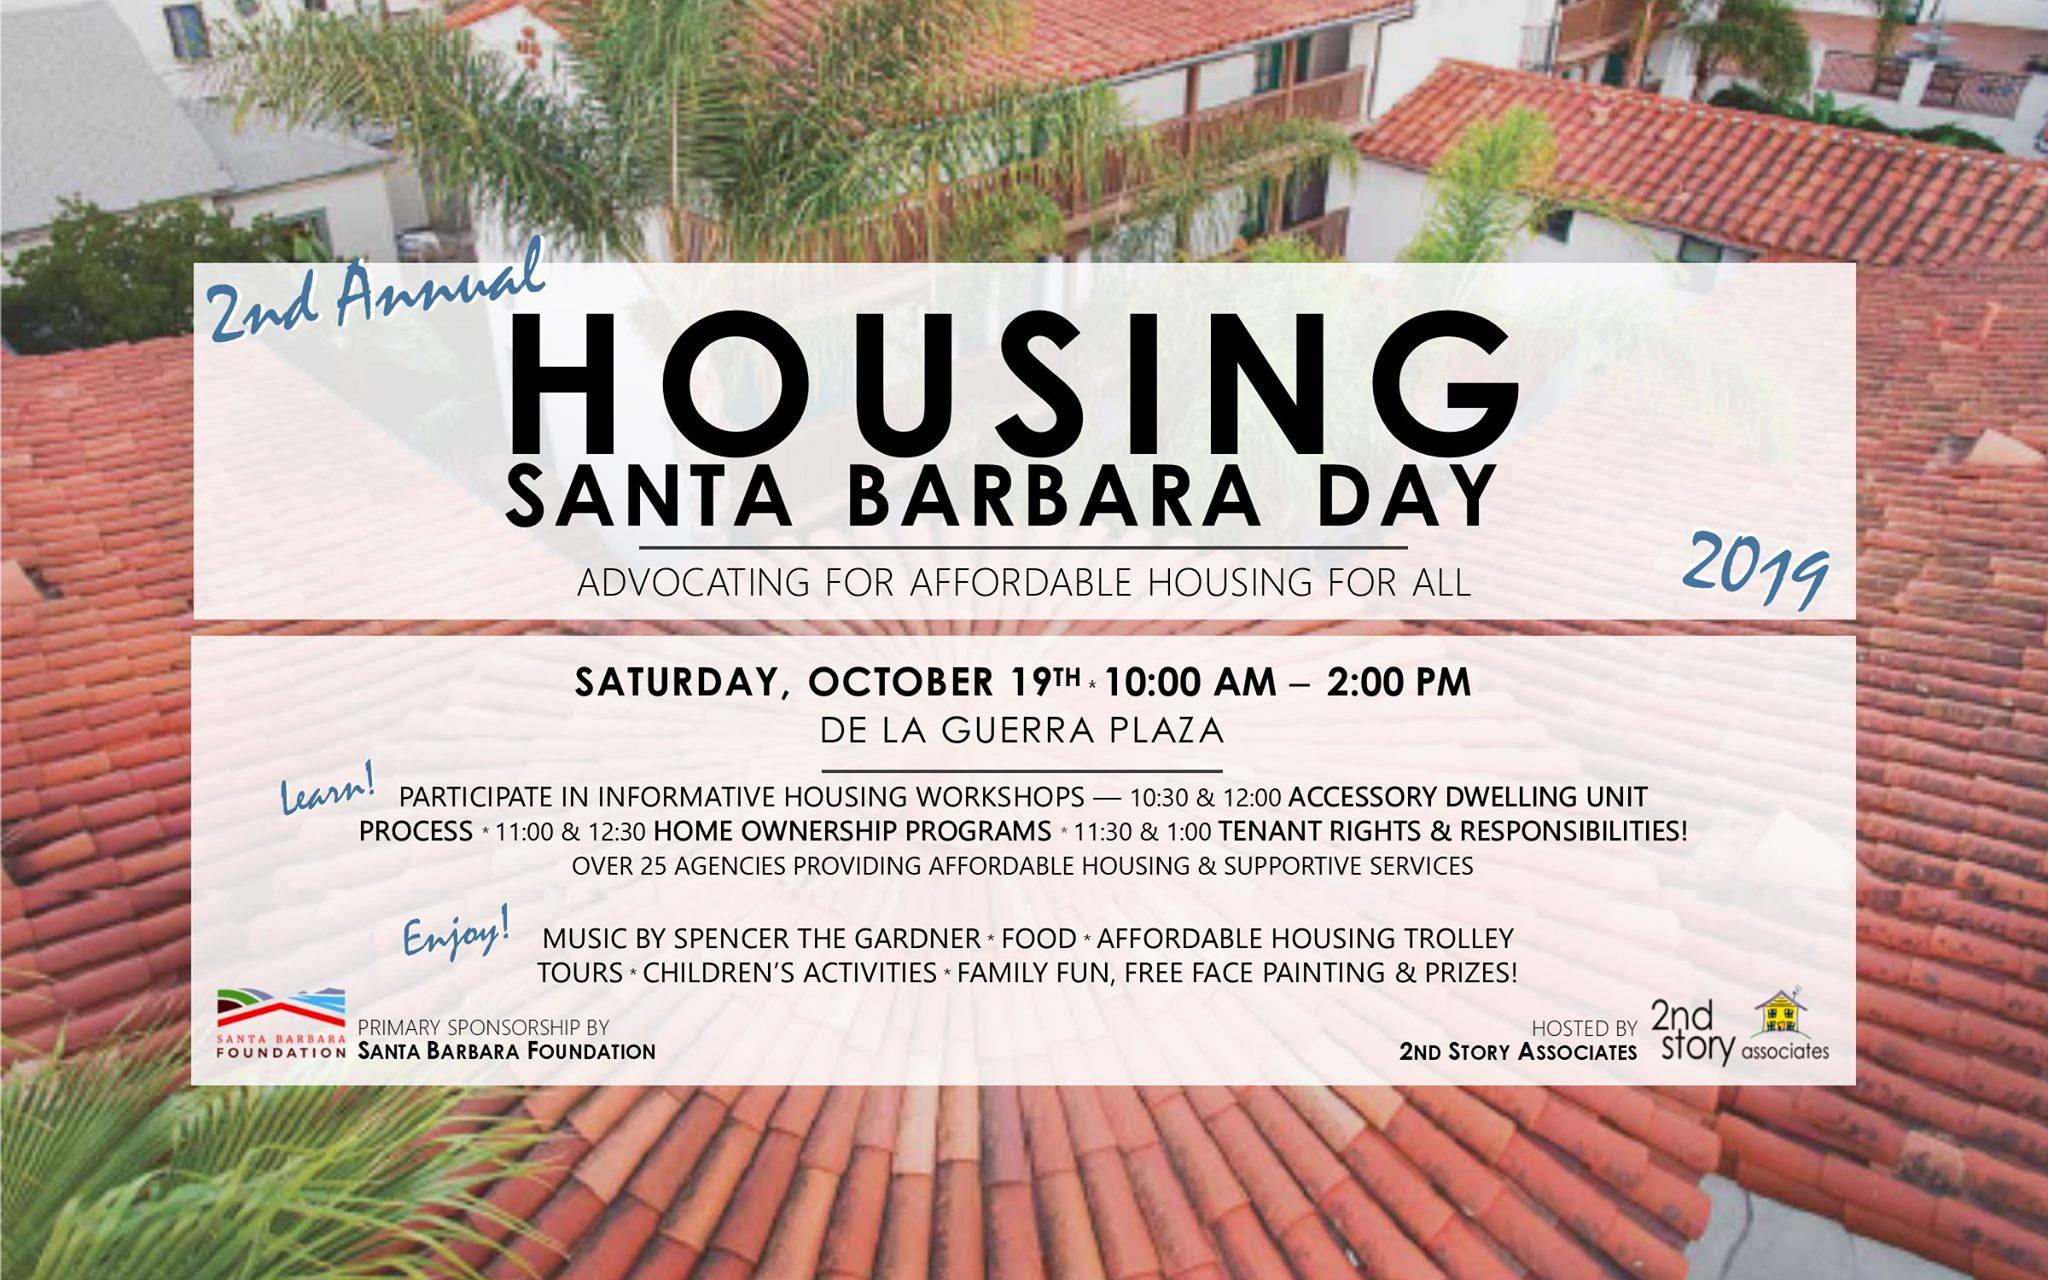 Housing Santa Barbara Day